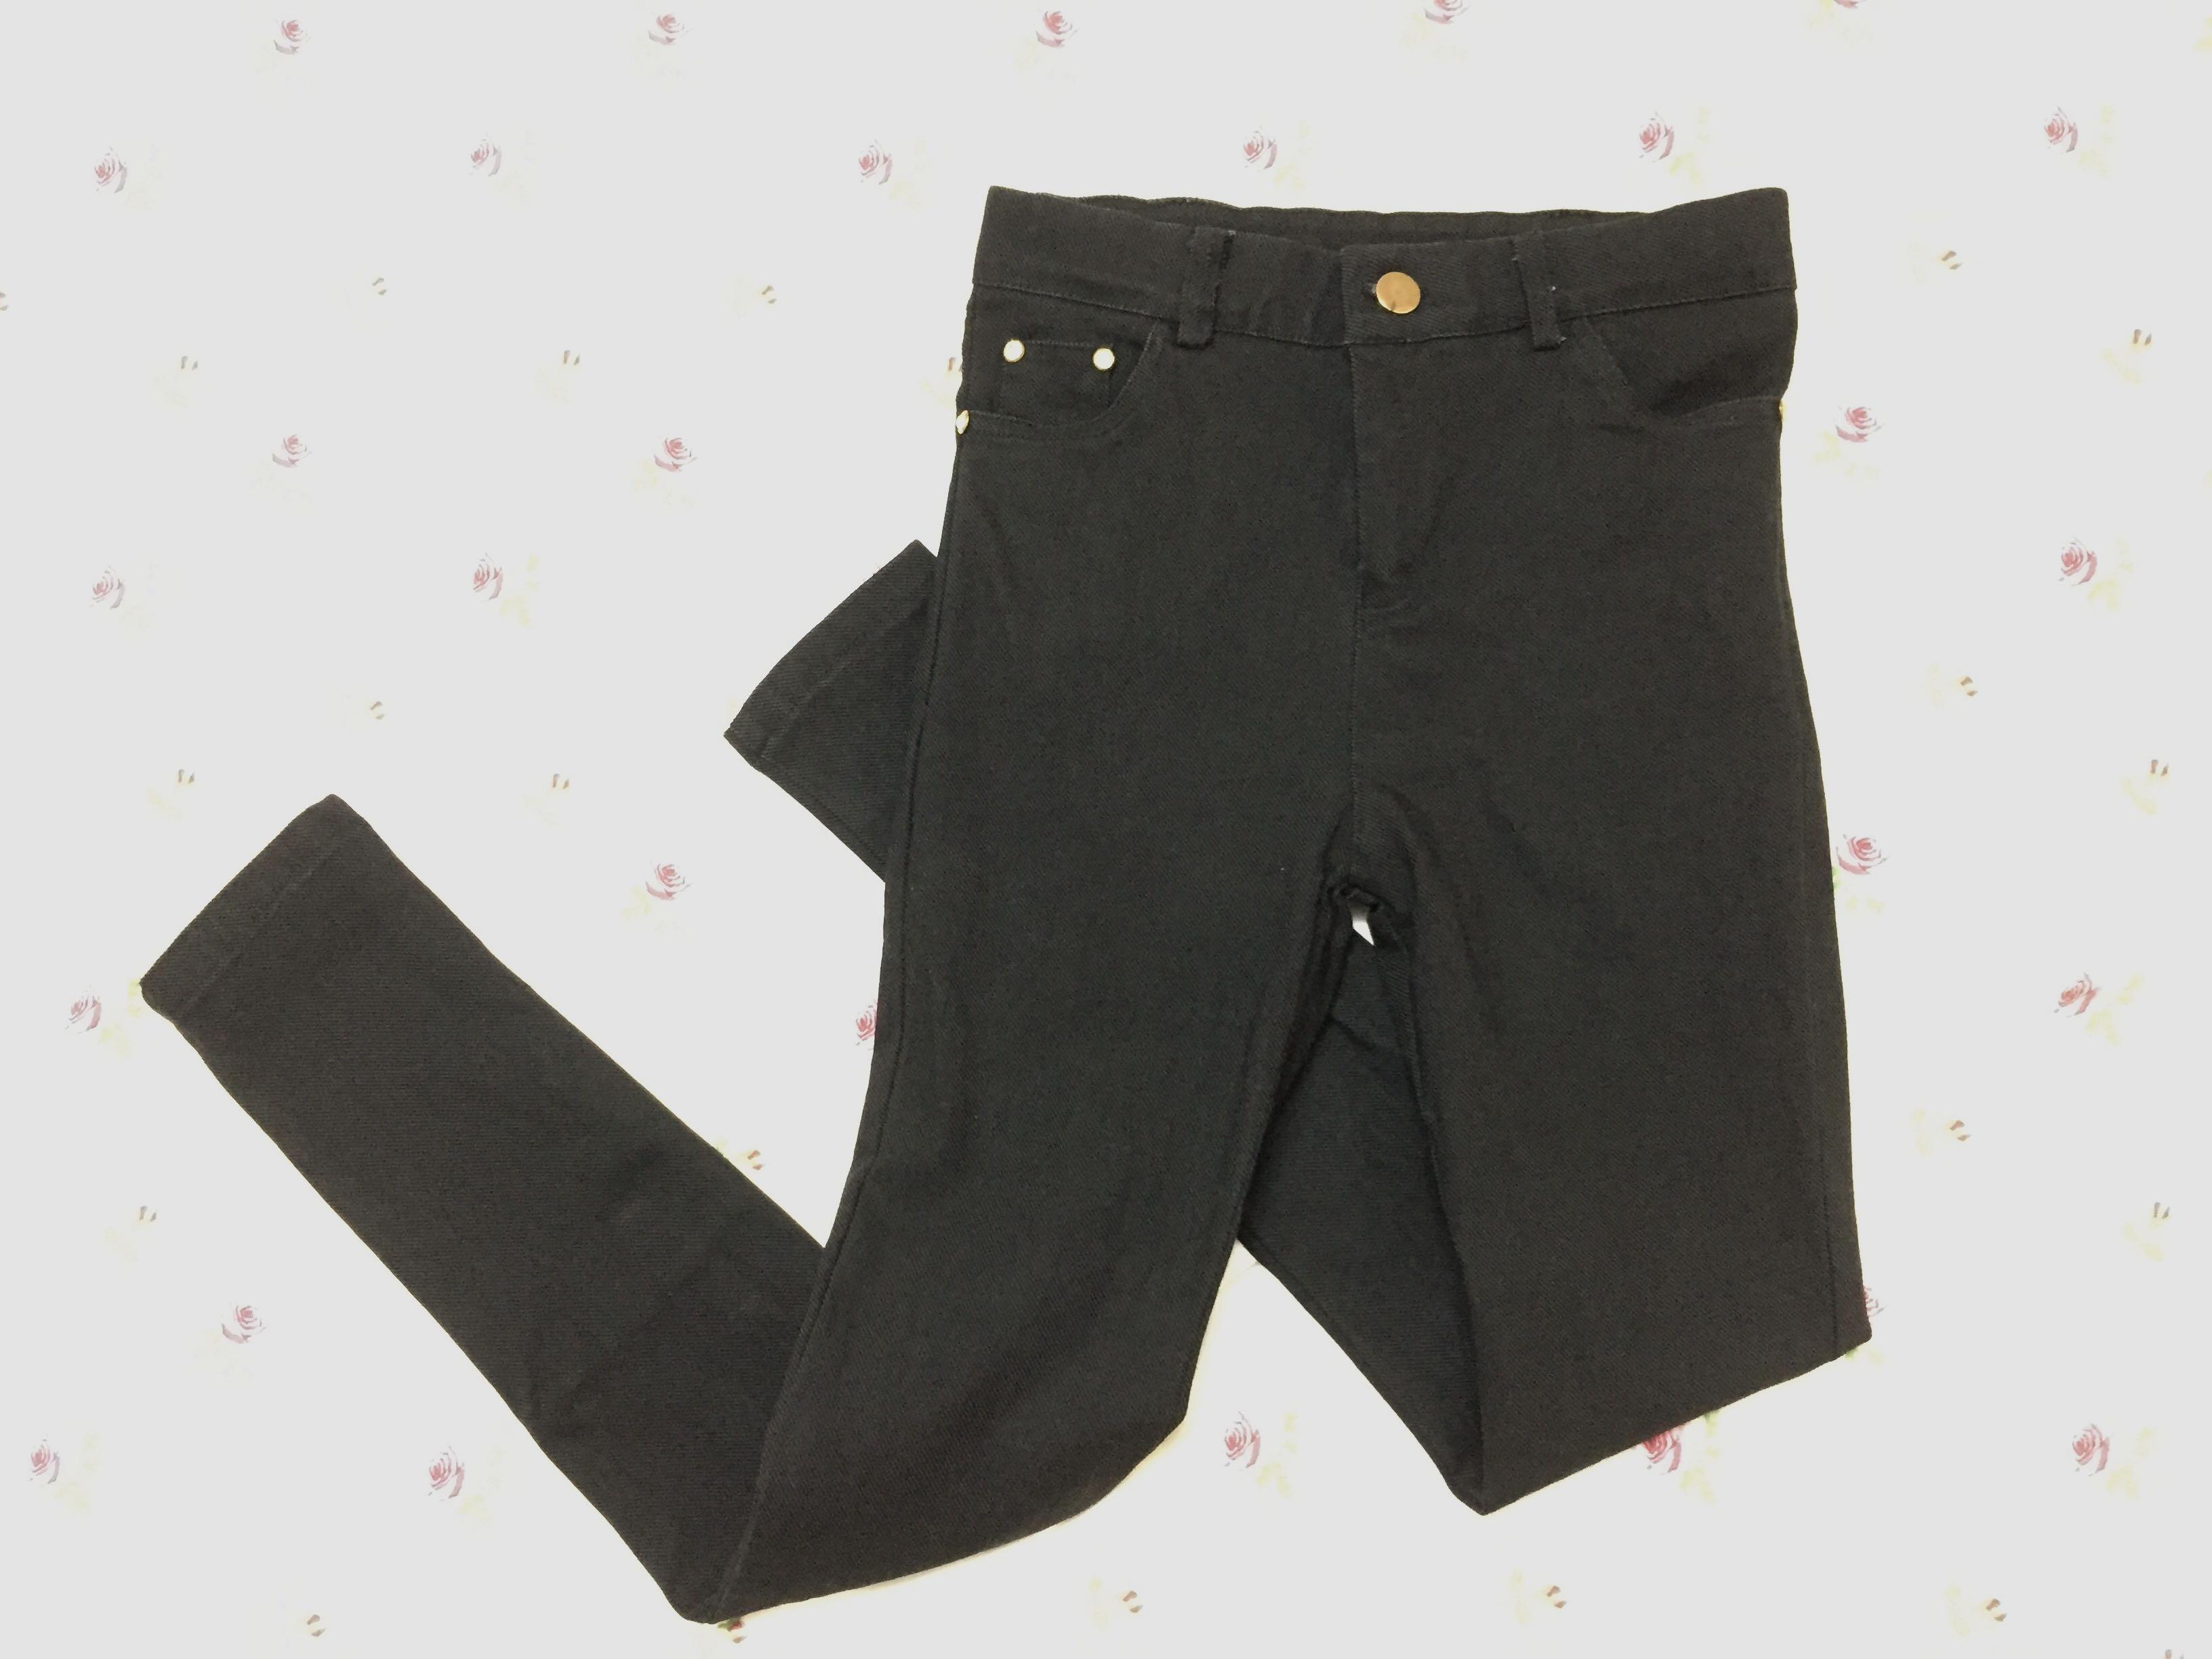 Black long skinny pants